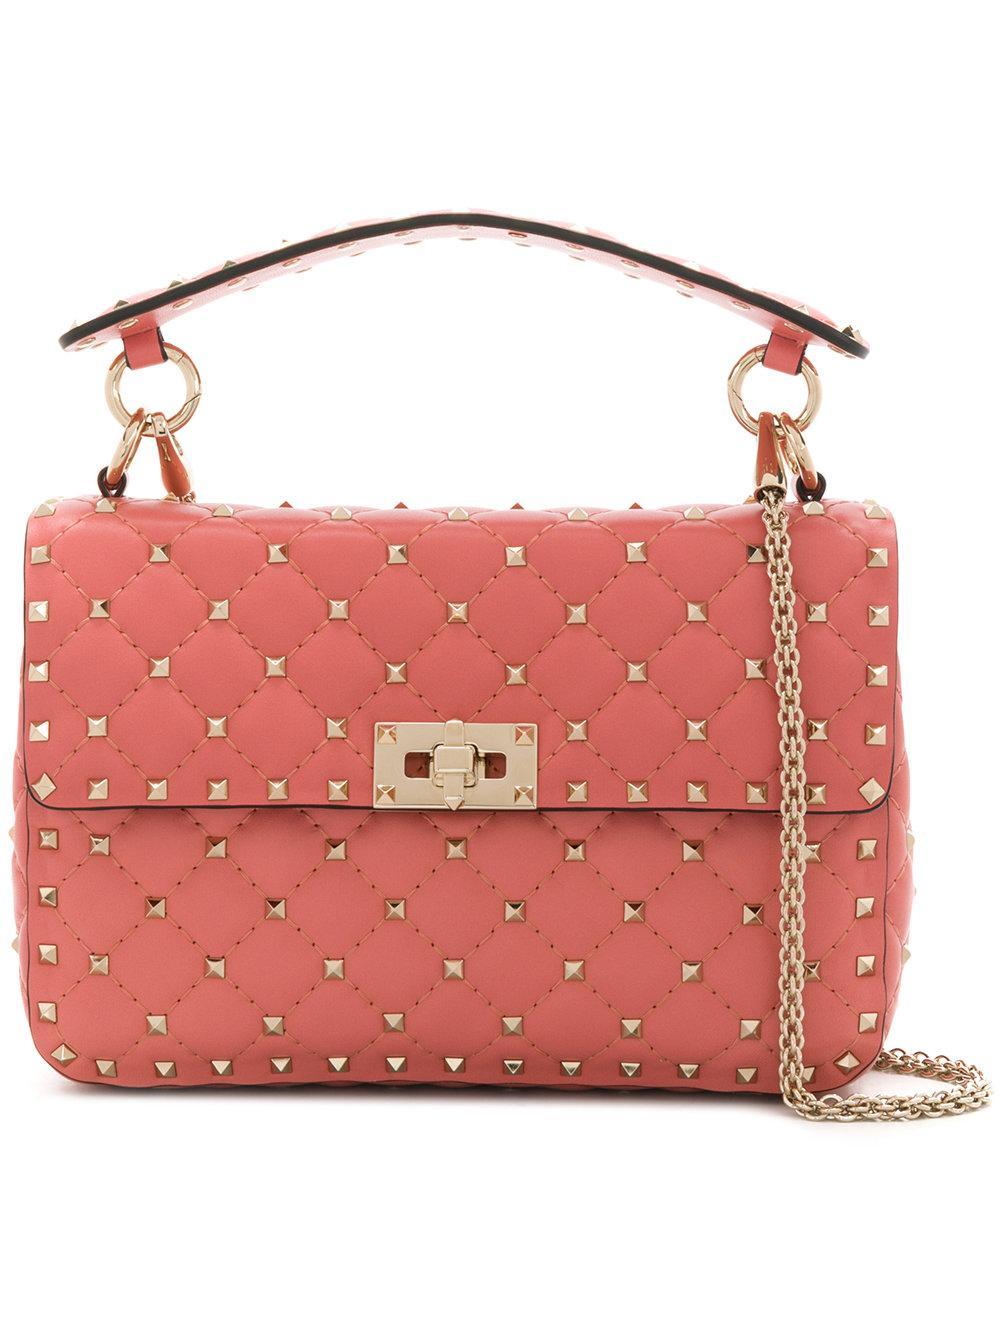 Valentino Garavani Studded Style Shoulder Bag